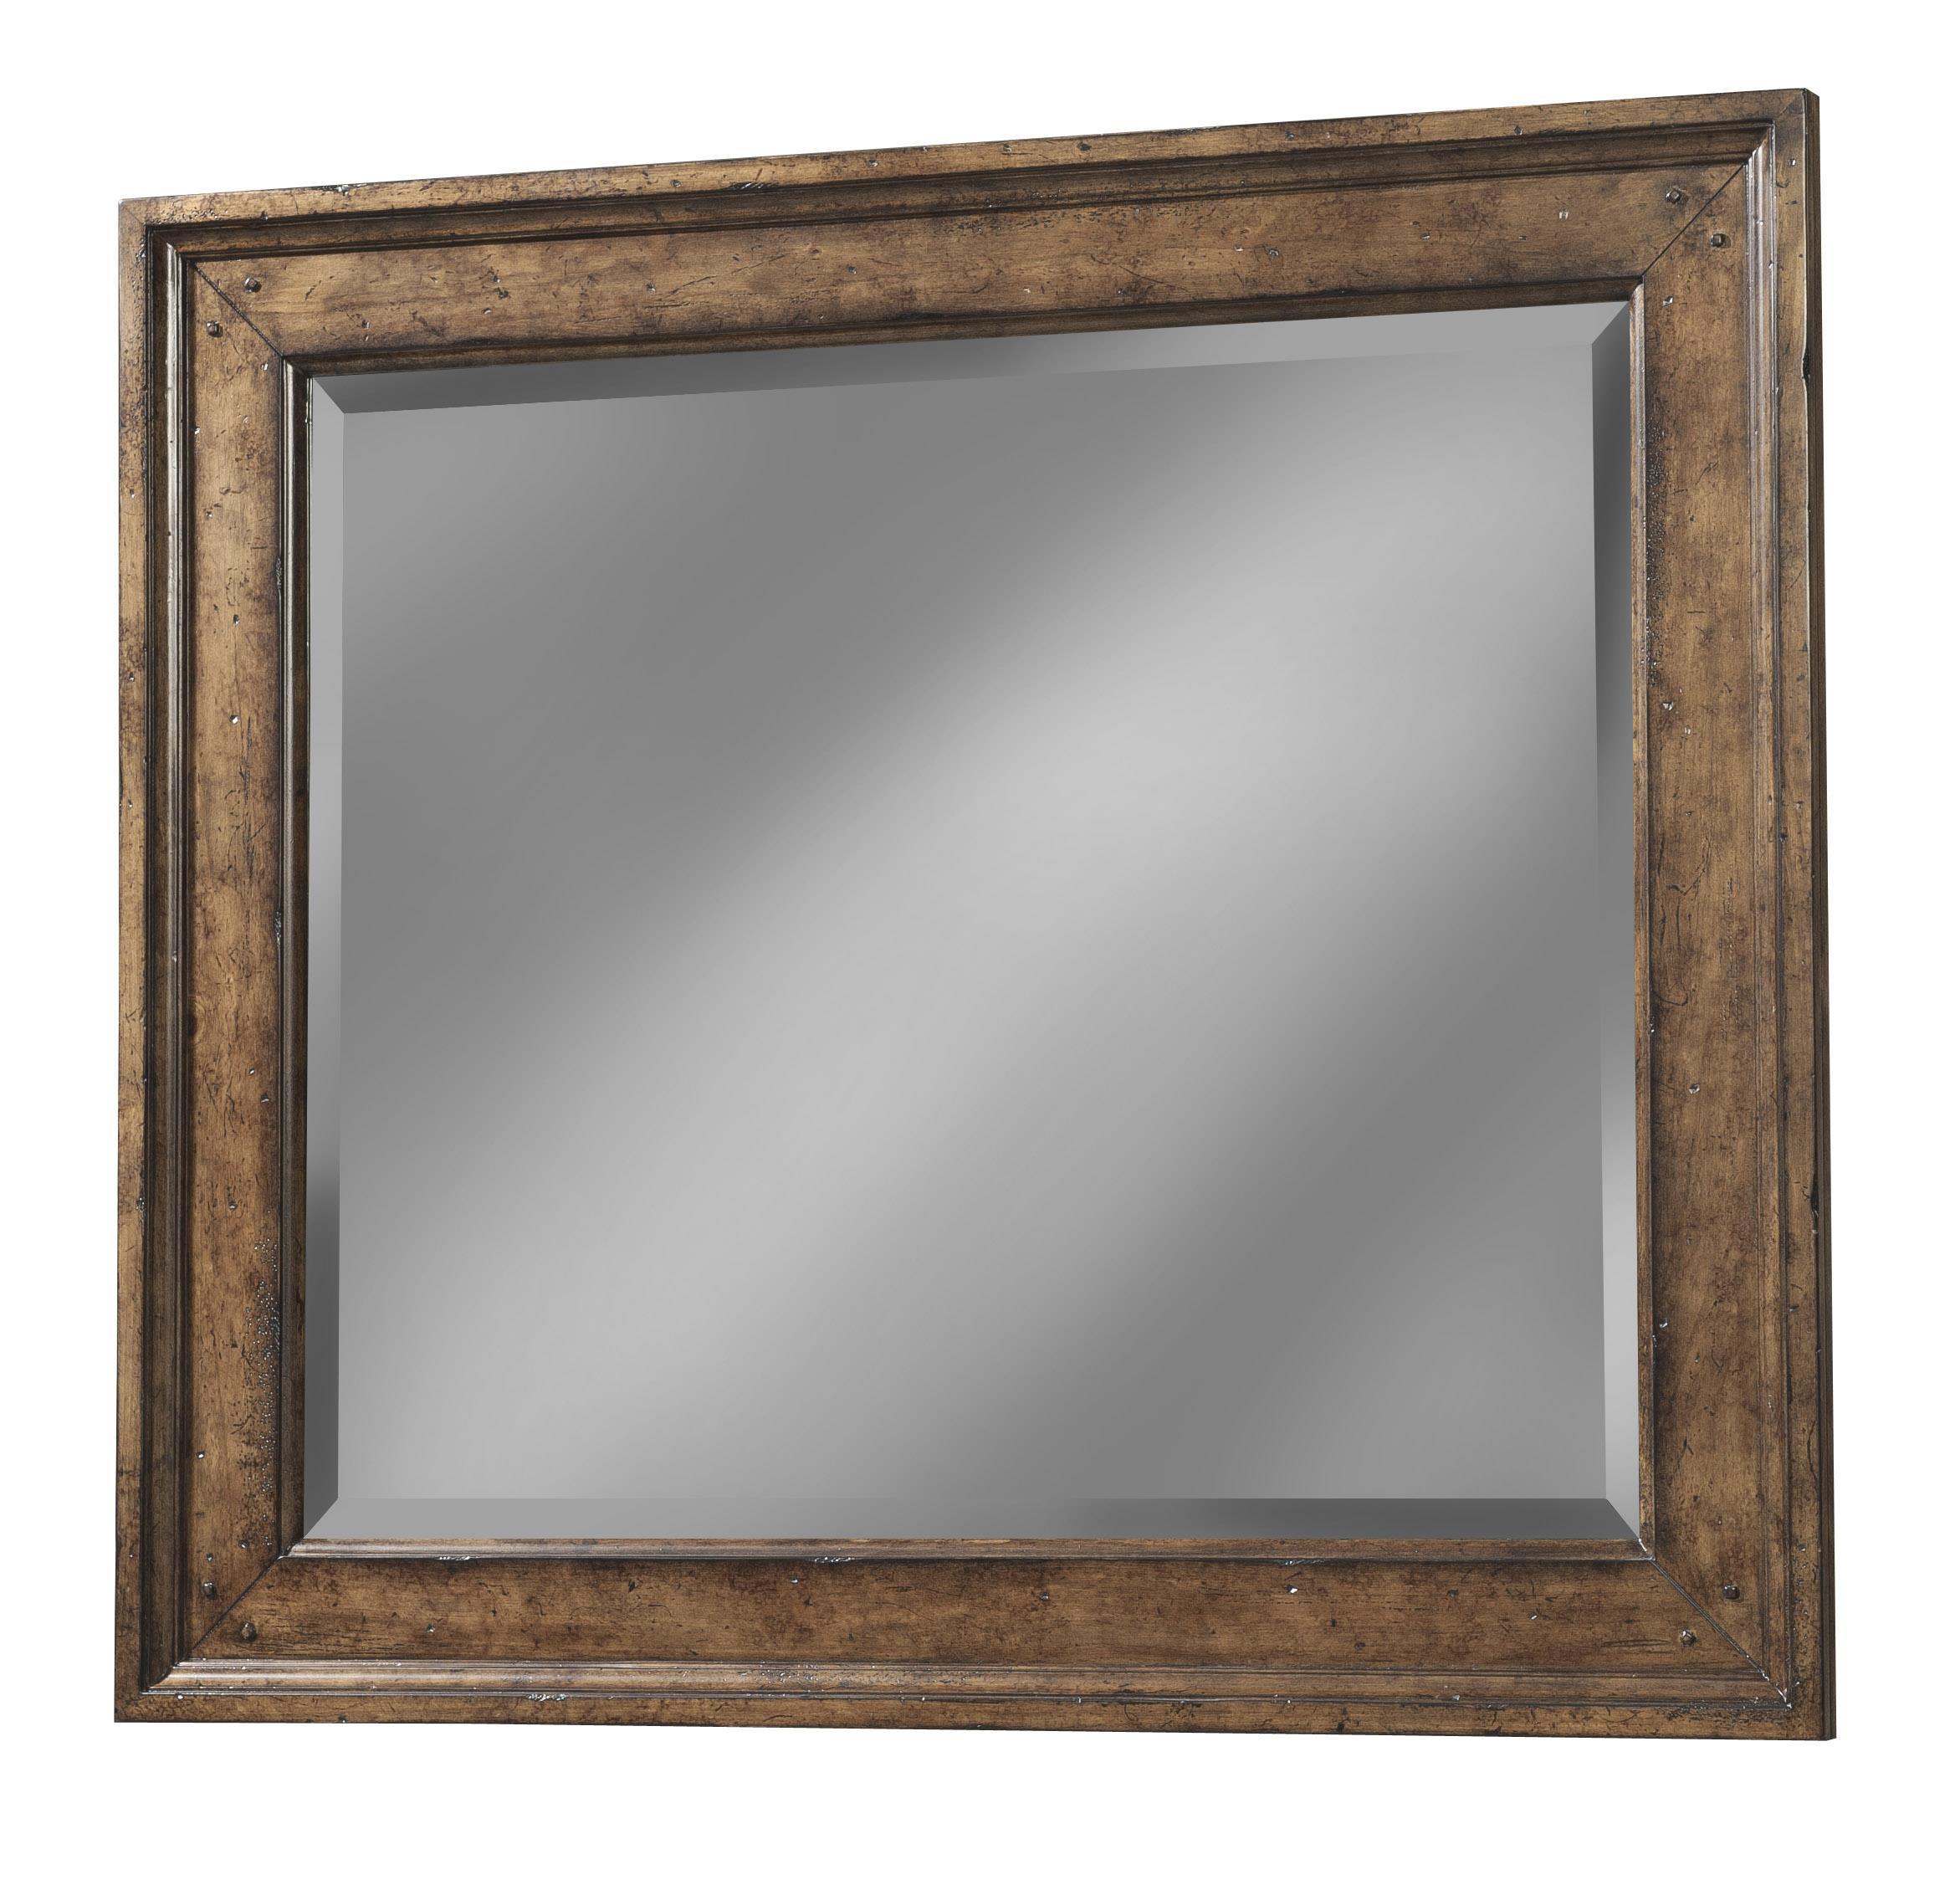 Easton Collection Farmhouse Landscape Mirror - Item Number: 436-660 MIRR